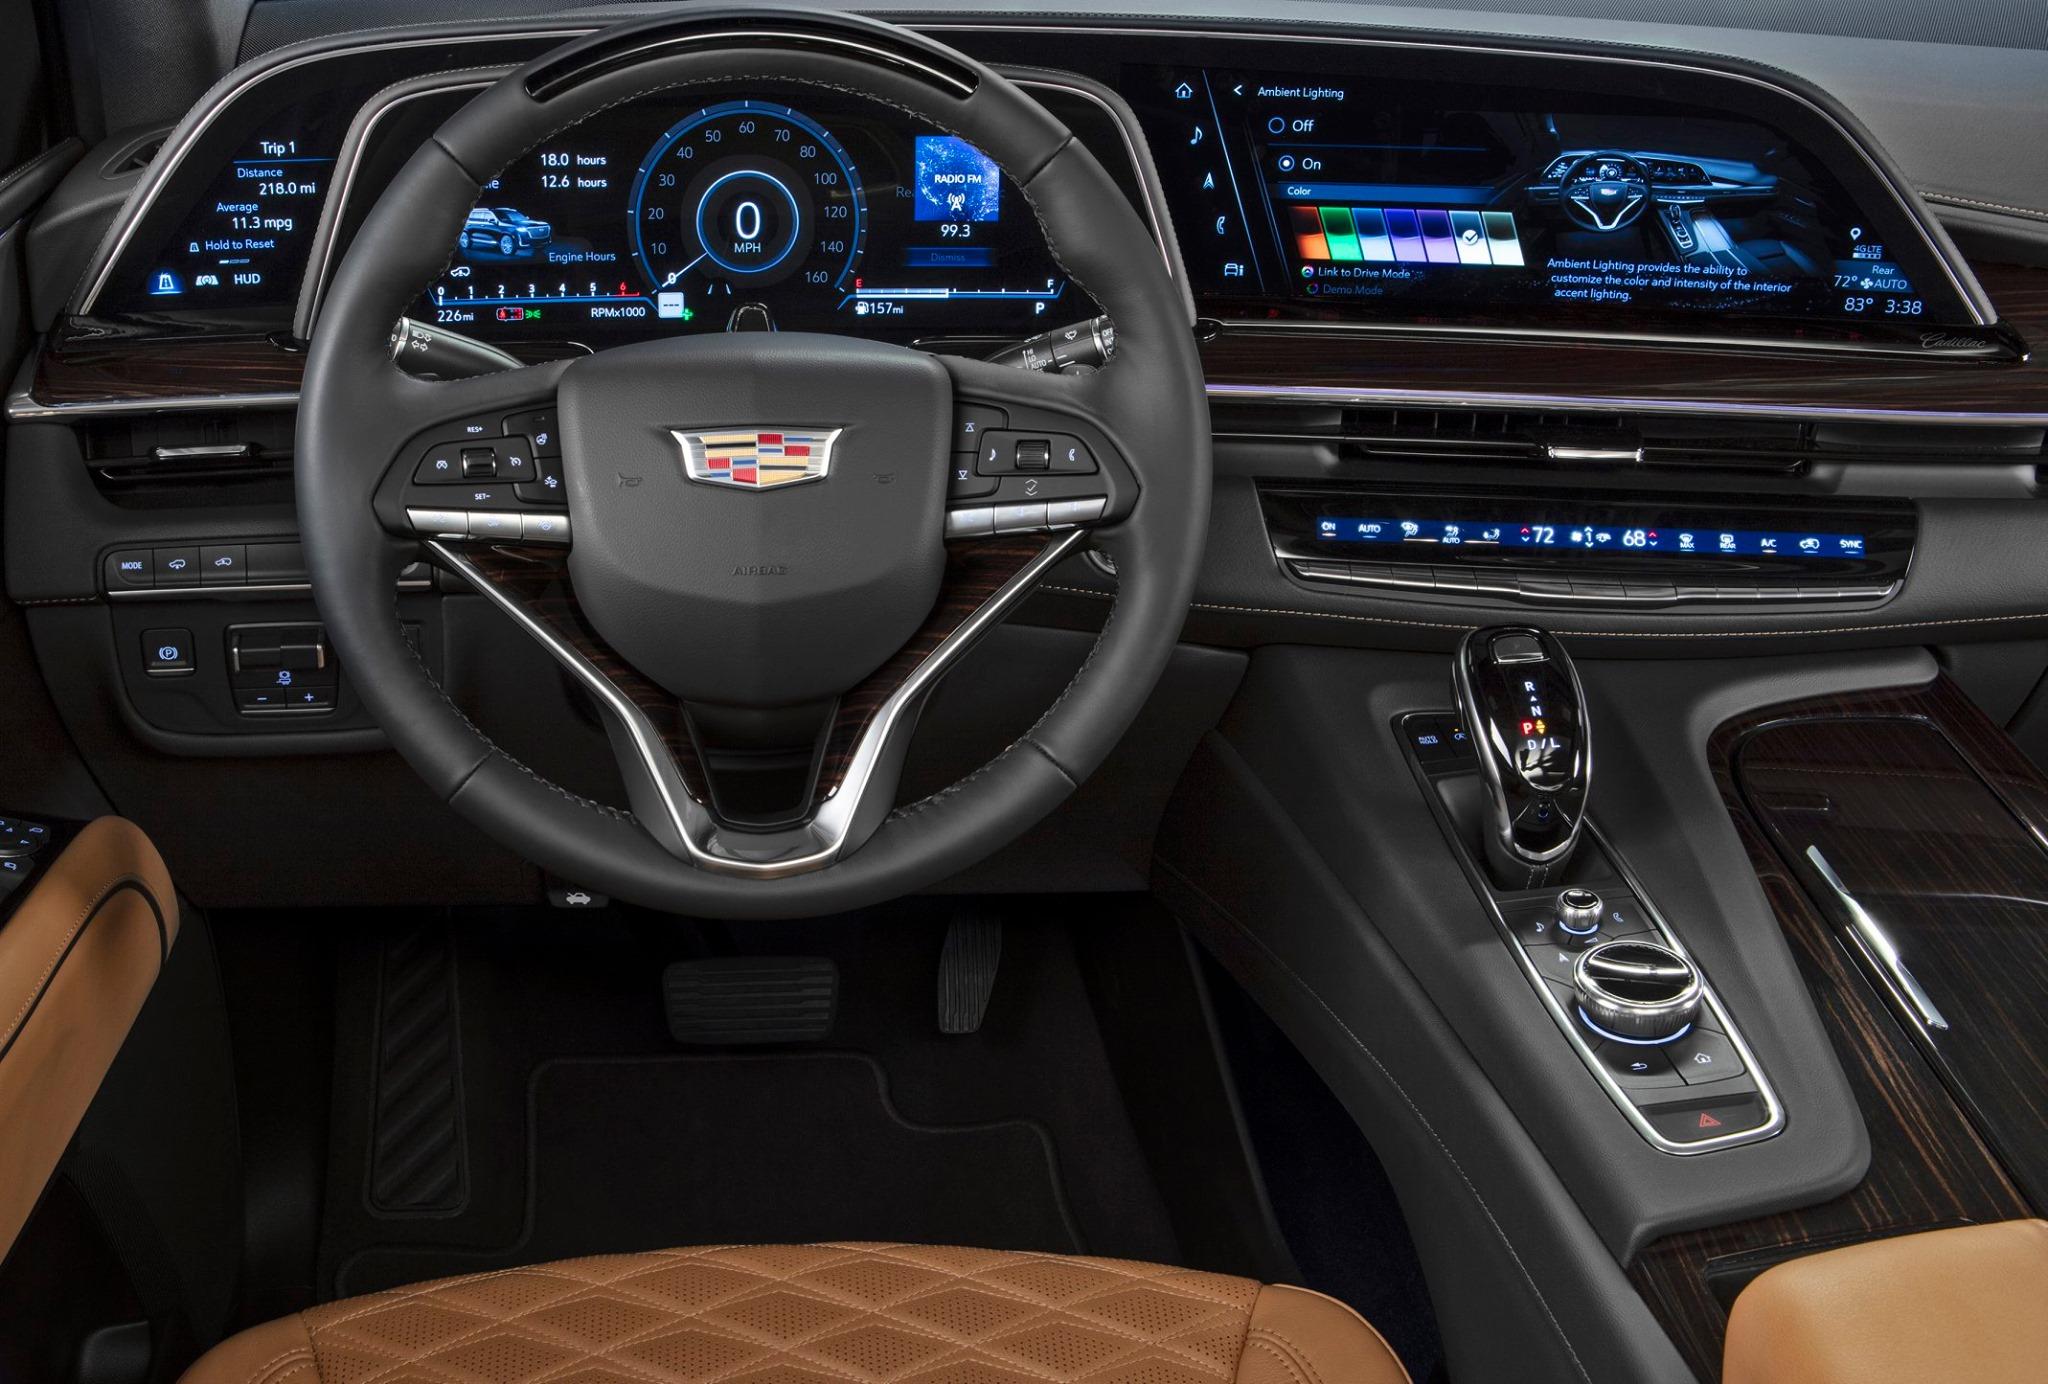 Cadillac Escalade 2021-quinta generacion-infoentretenimiento pantalla